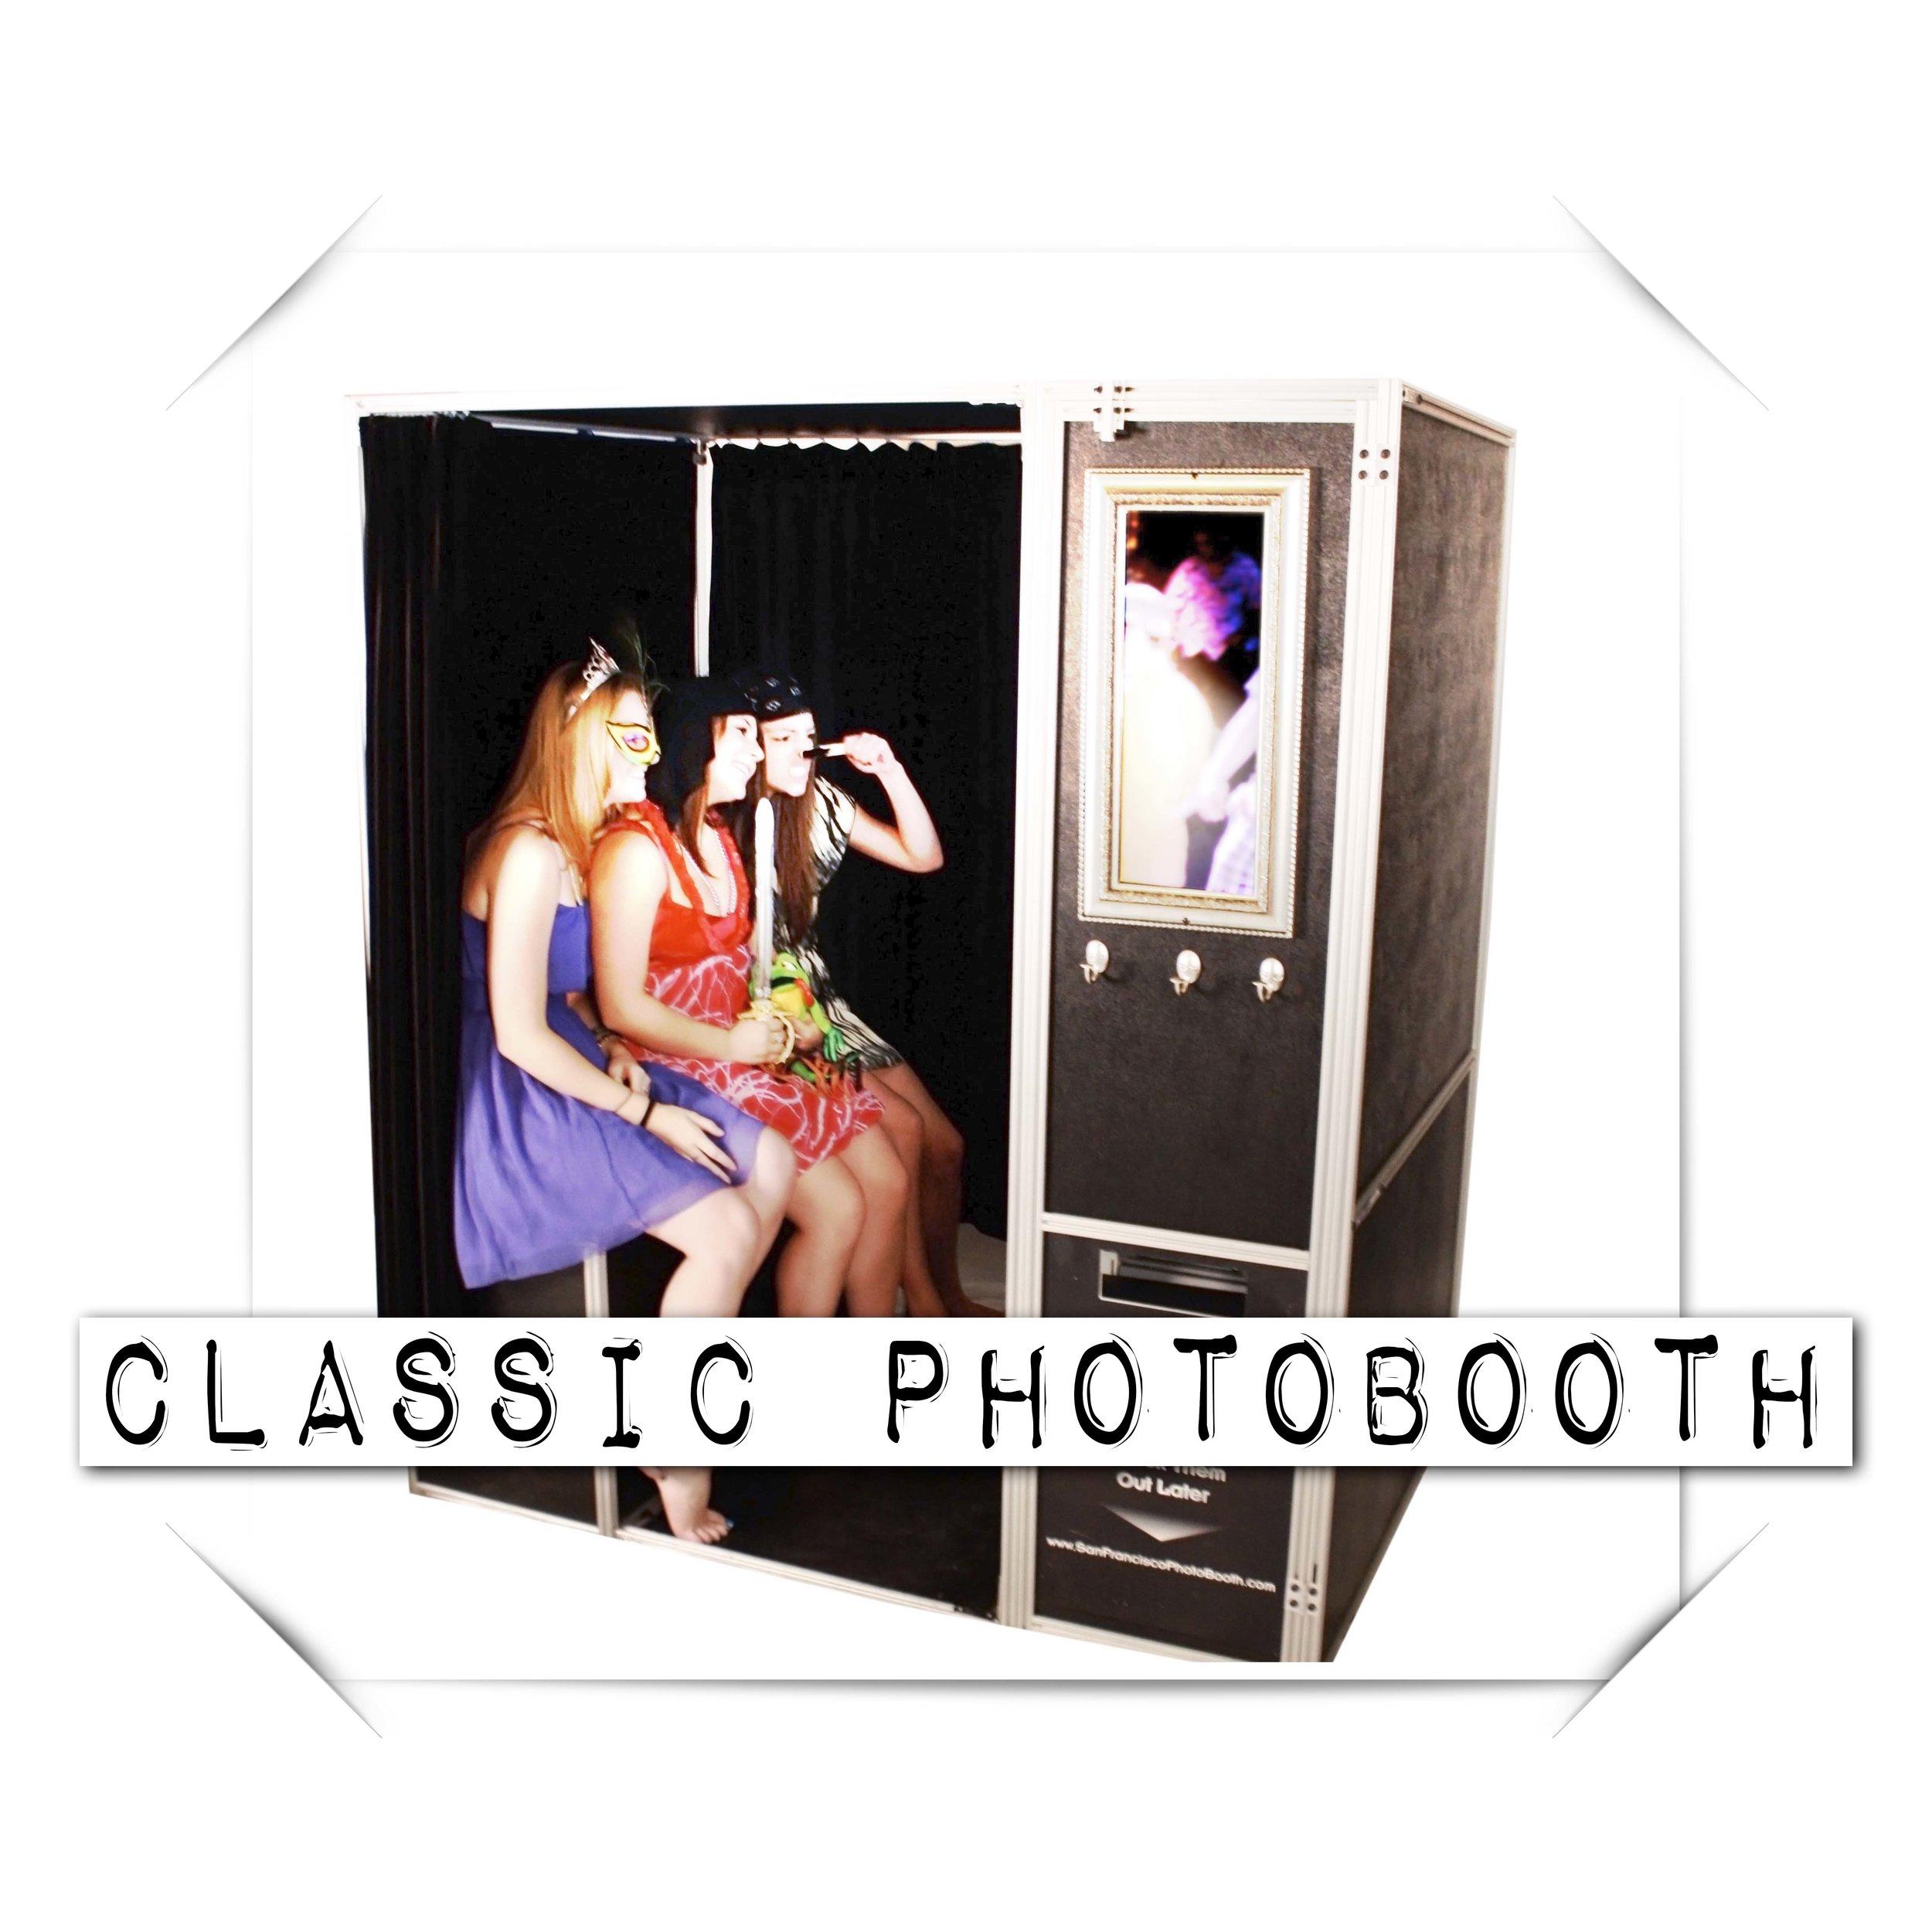 Classic_Photobooth.jpg